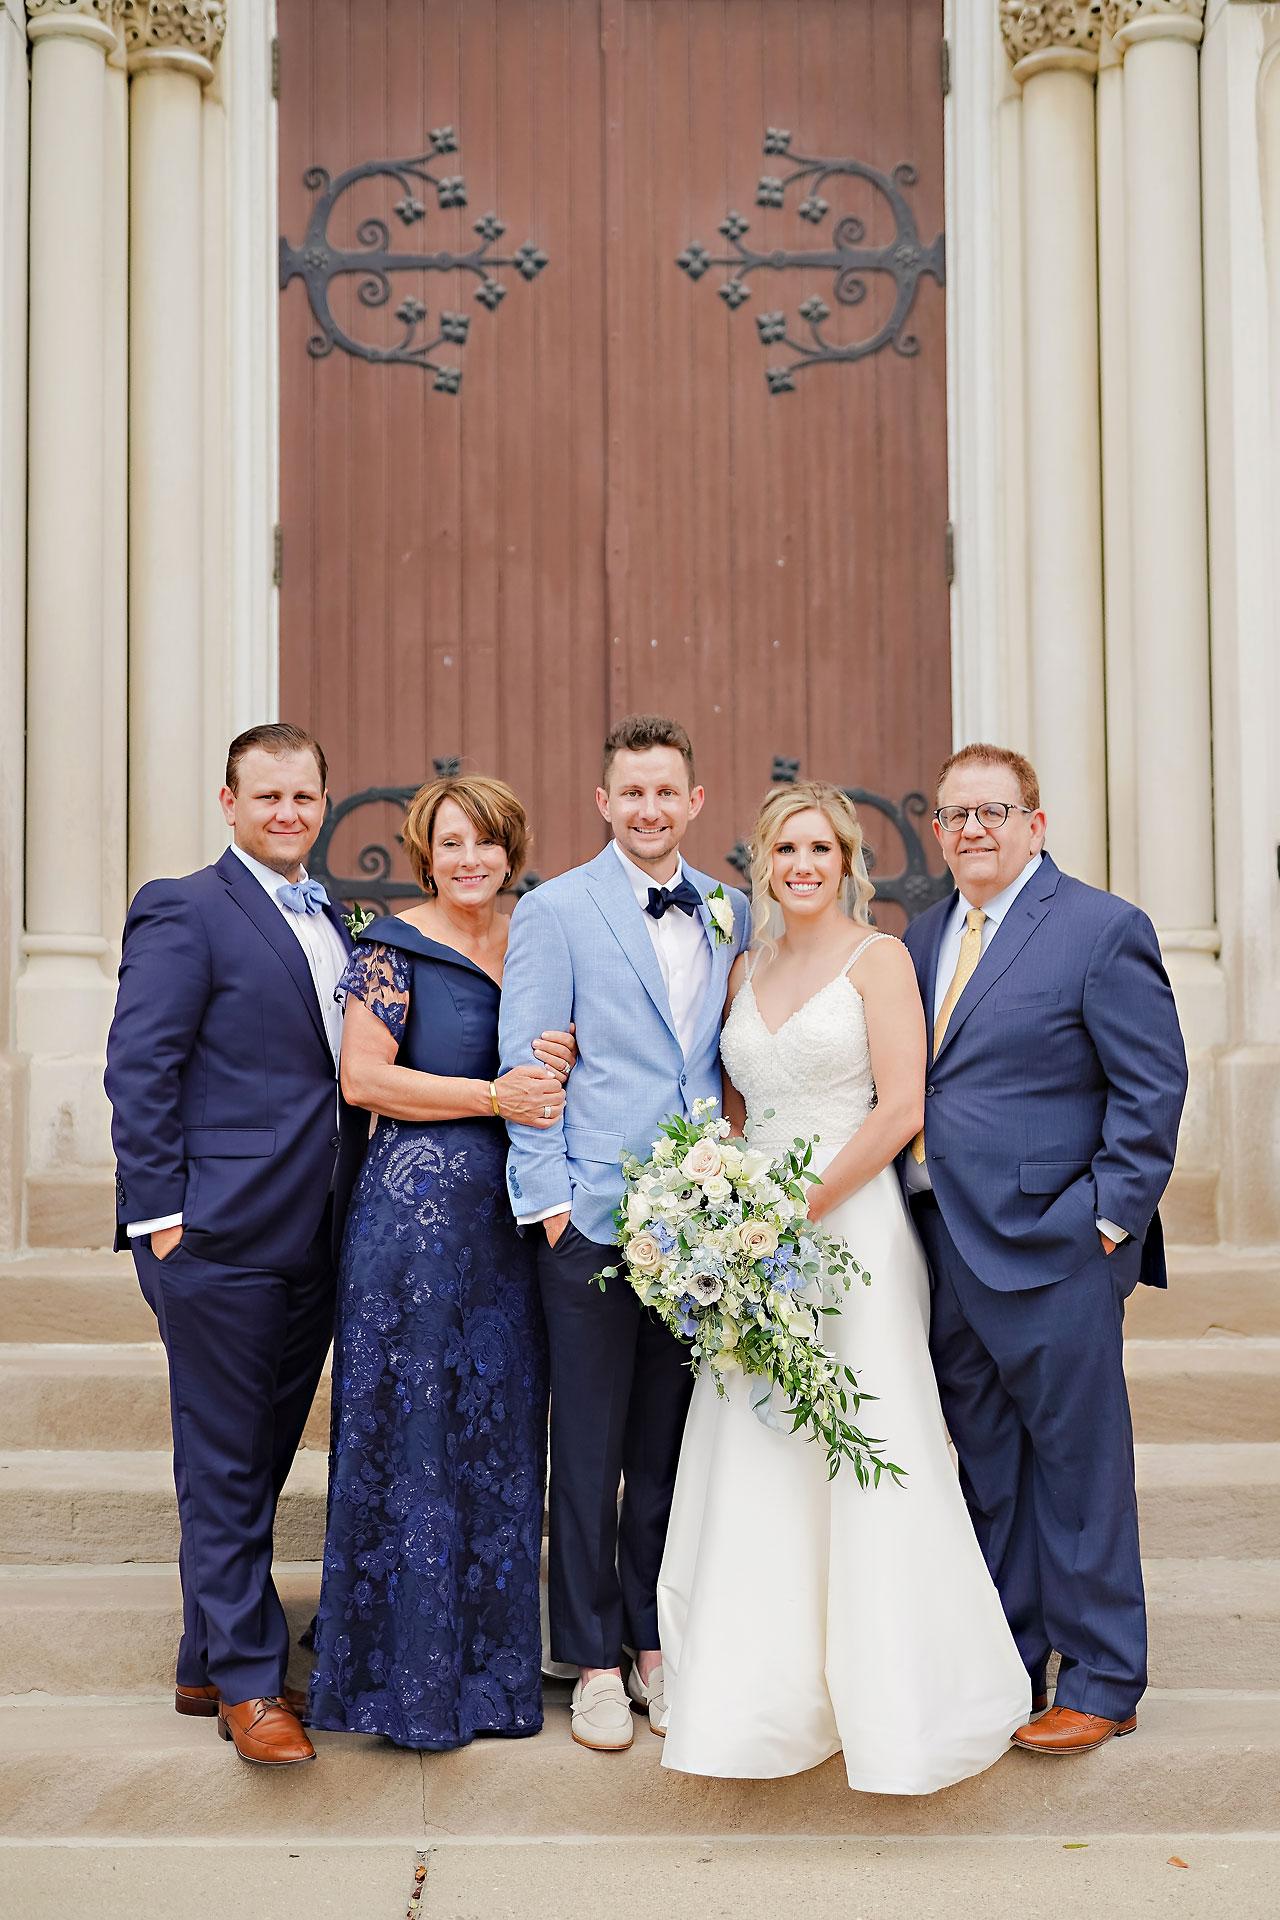 Sammi Jack Regions Tower JPS Events Indianapolis Wedding 149